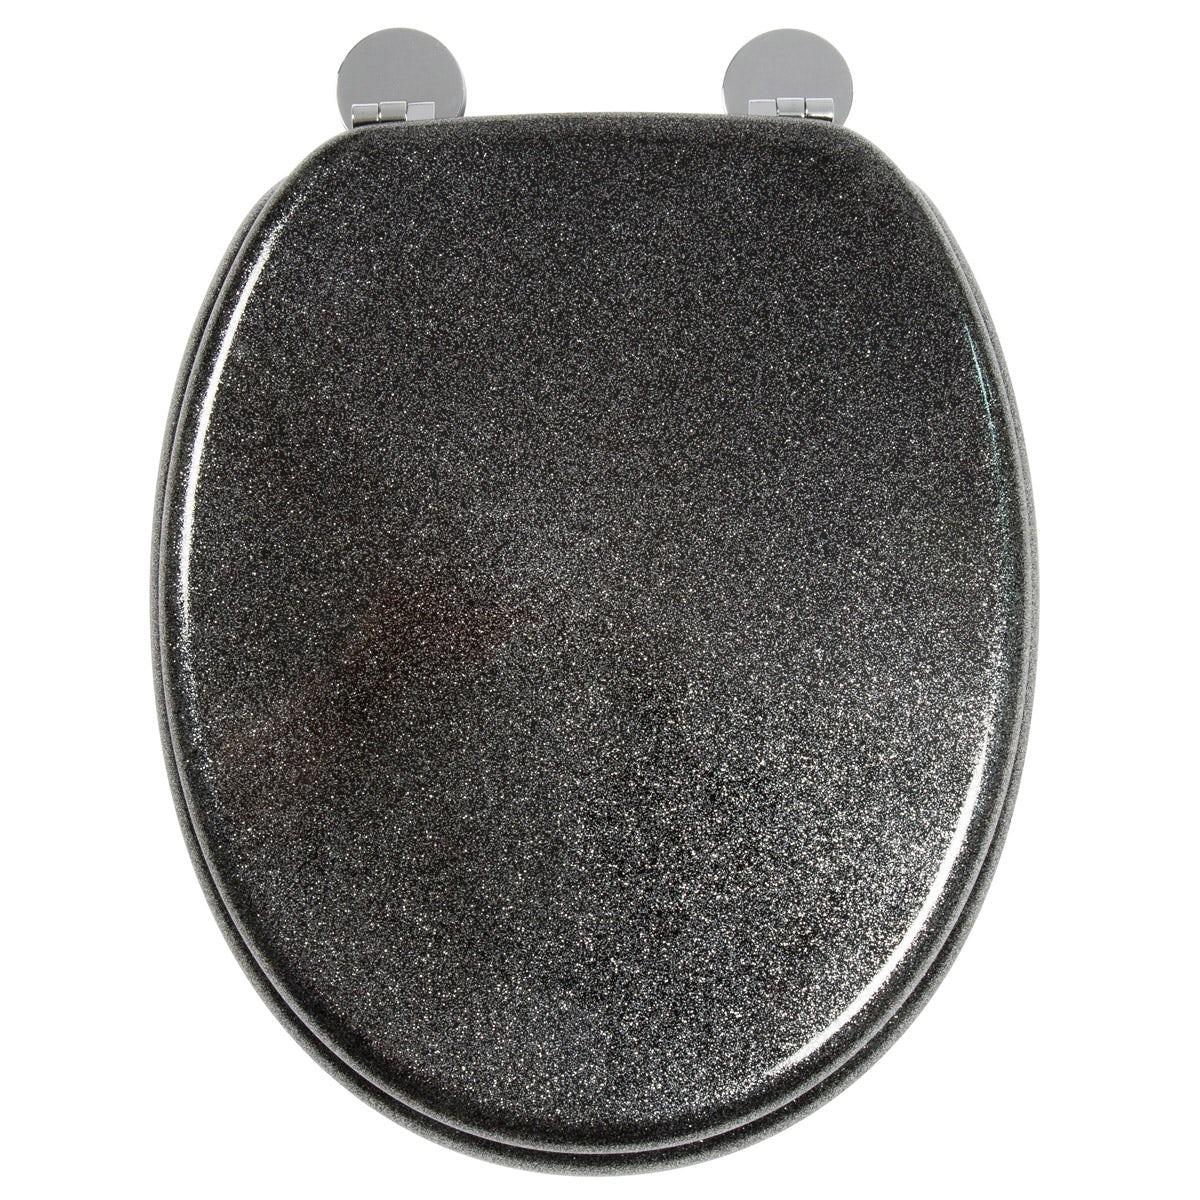 Croydex Black Quartz Flexi Fix Toilet Seat Victoriaplum Com